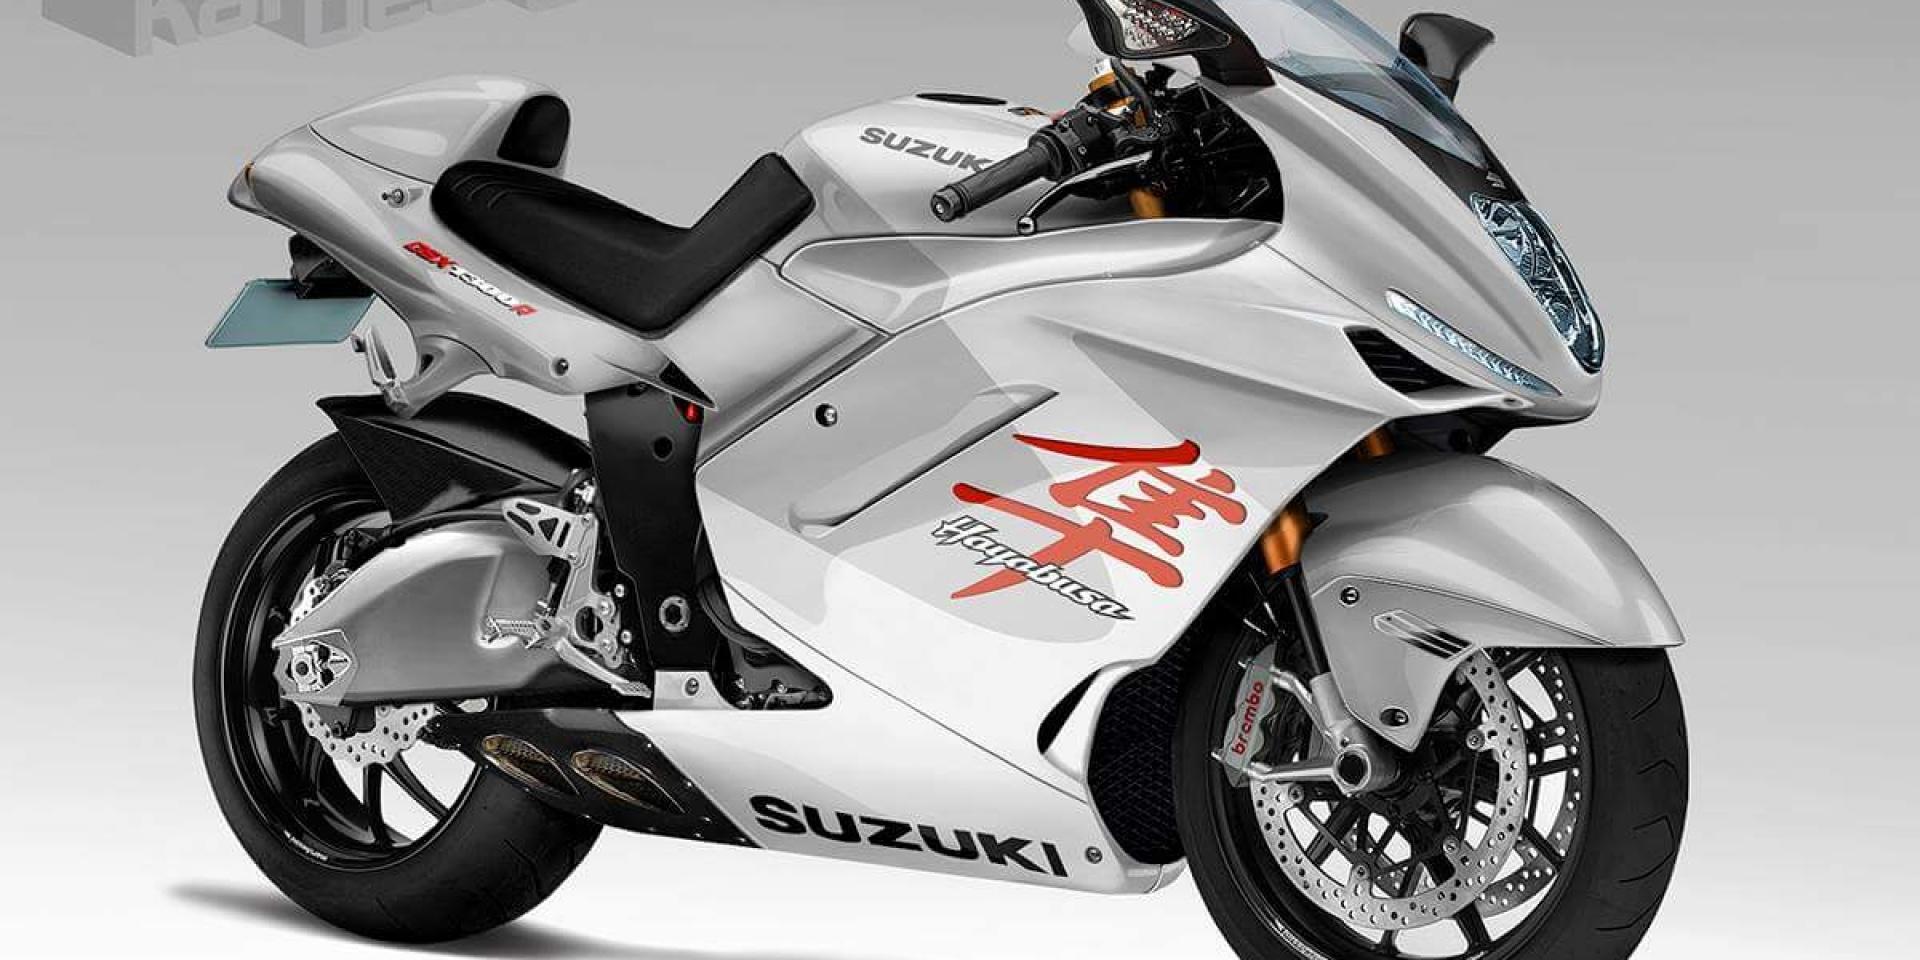 H2/R 勁敵出現!SUZUKI Hayabusa 將於明年搭載渦輪增壓系統